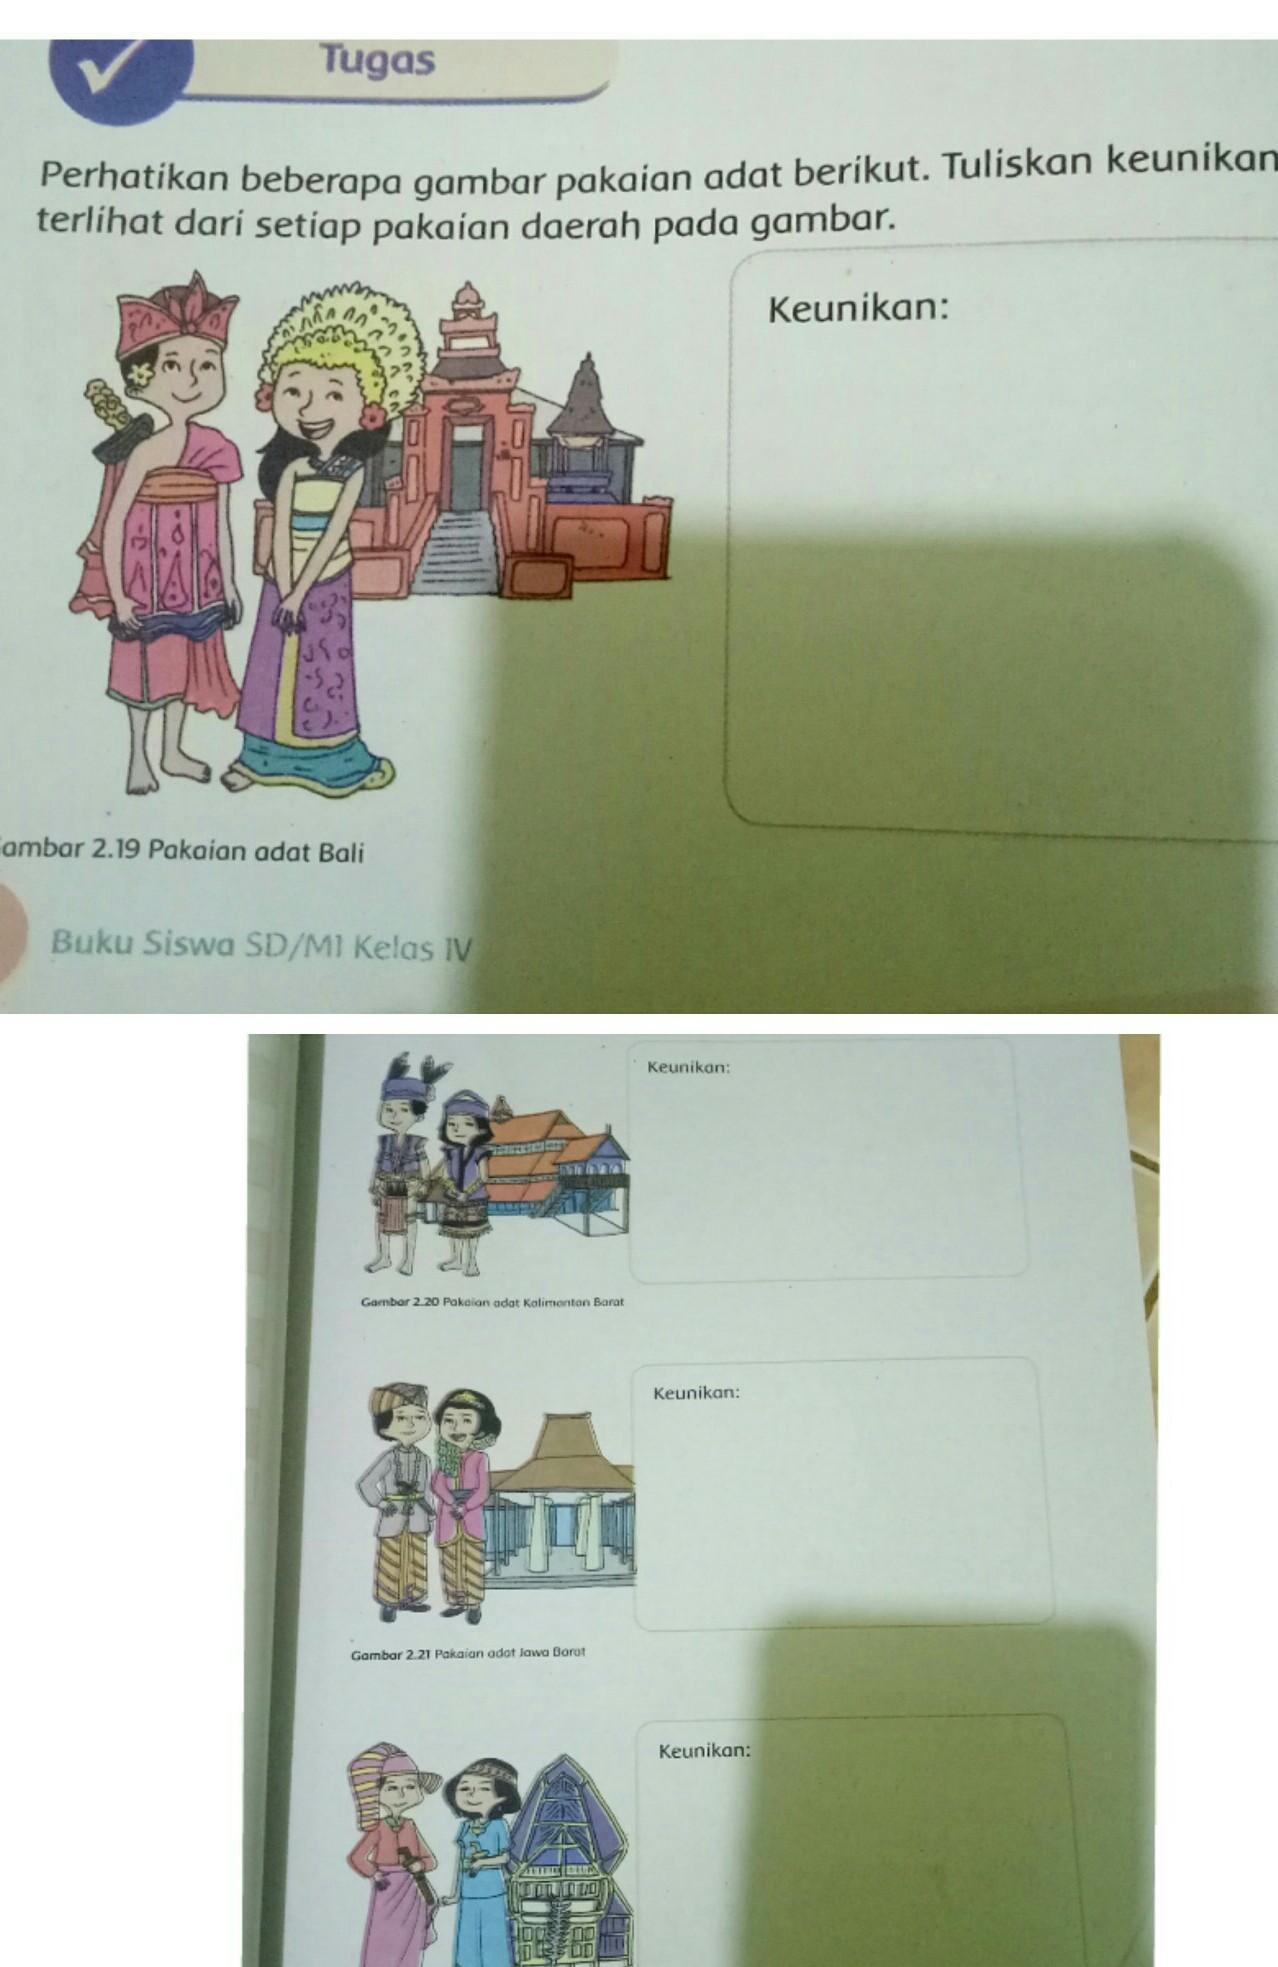 Keunikan Jawa Barat : keunikan, barat, Tolong, Bantu, Plase, Brainly.co.id